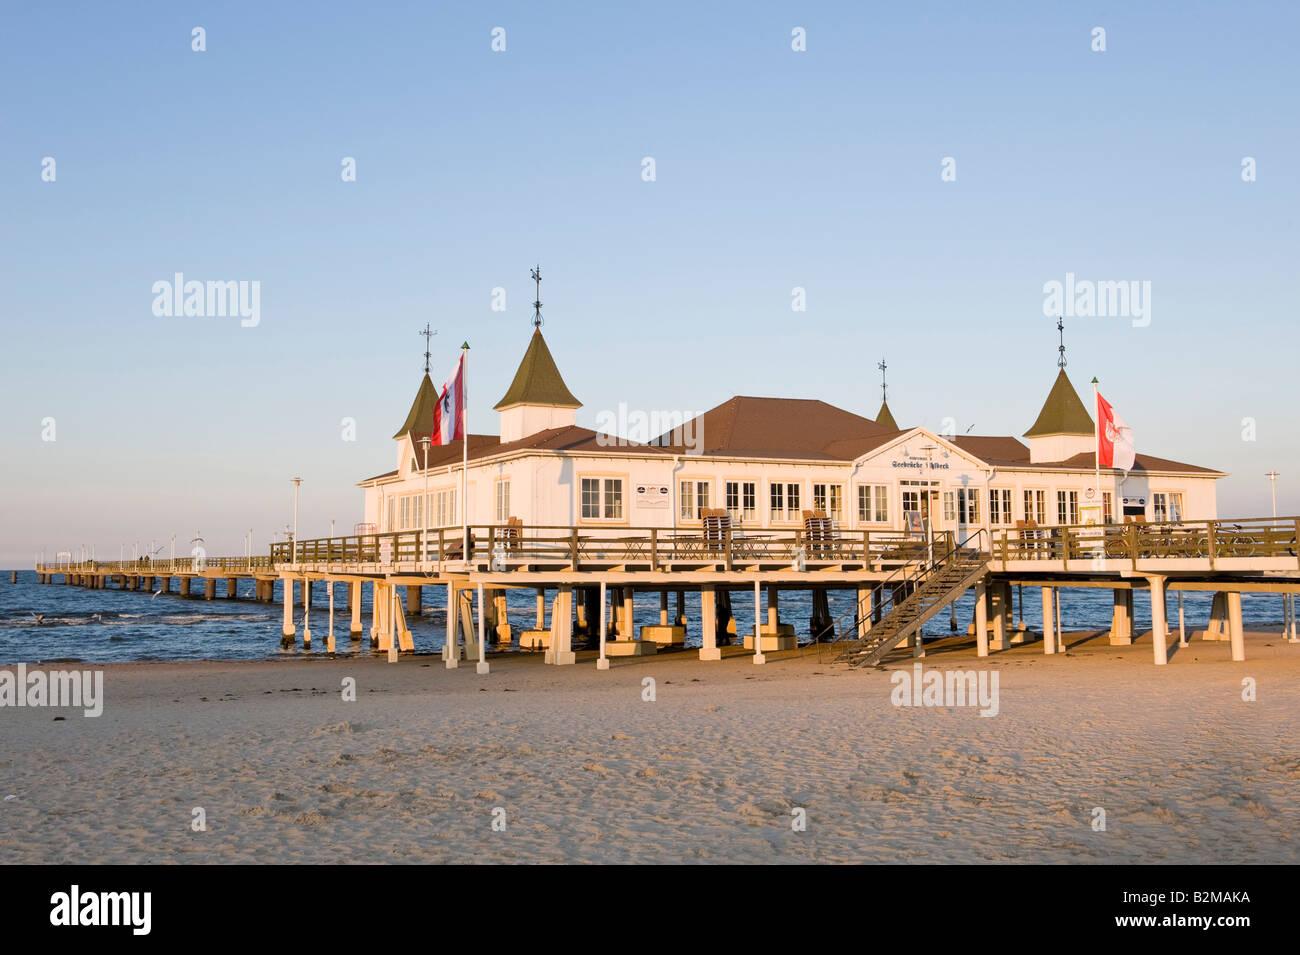 Historic pier, Ahlbeck seaside resort, Usedom Island, Mecklenburg-Western Pomerania, Germany, Europe - Stock Image